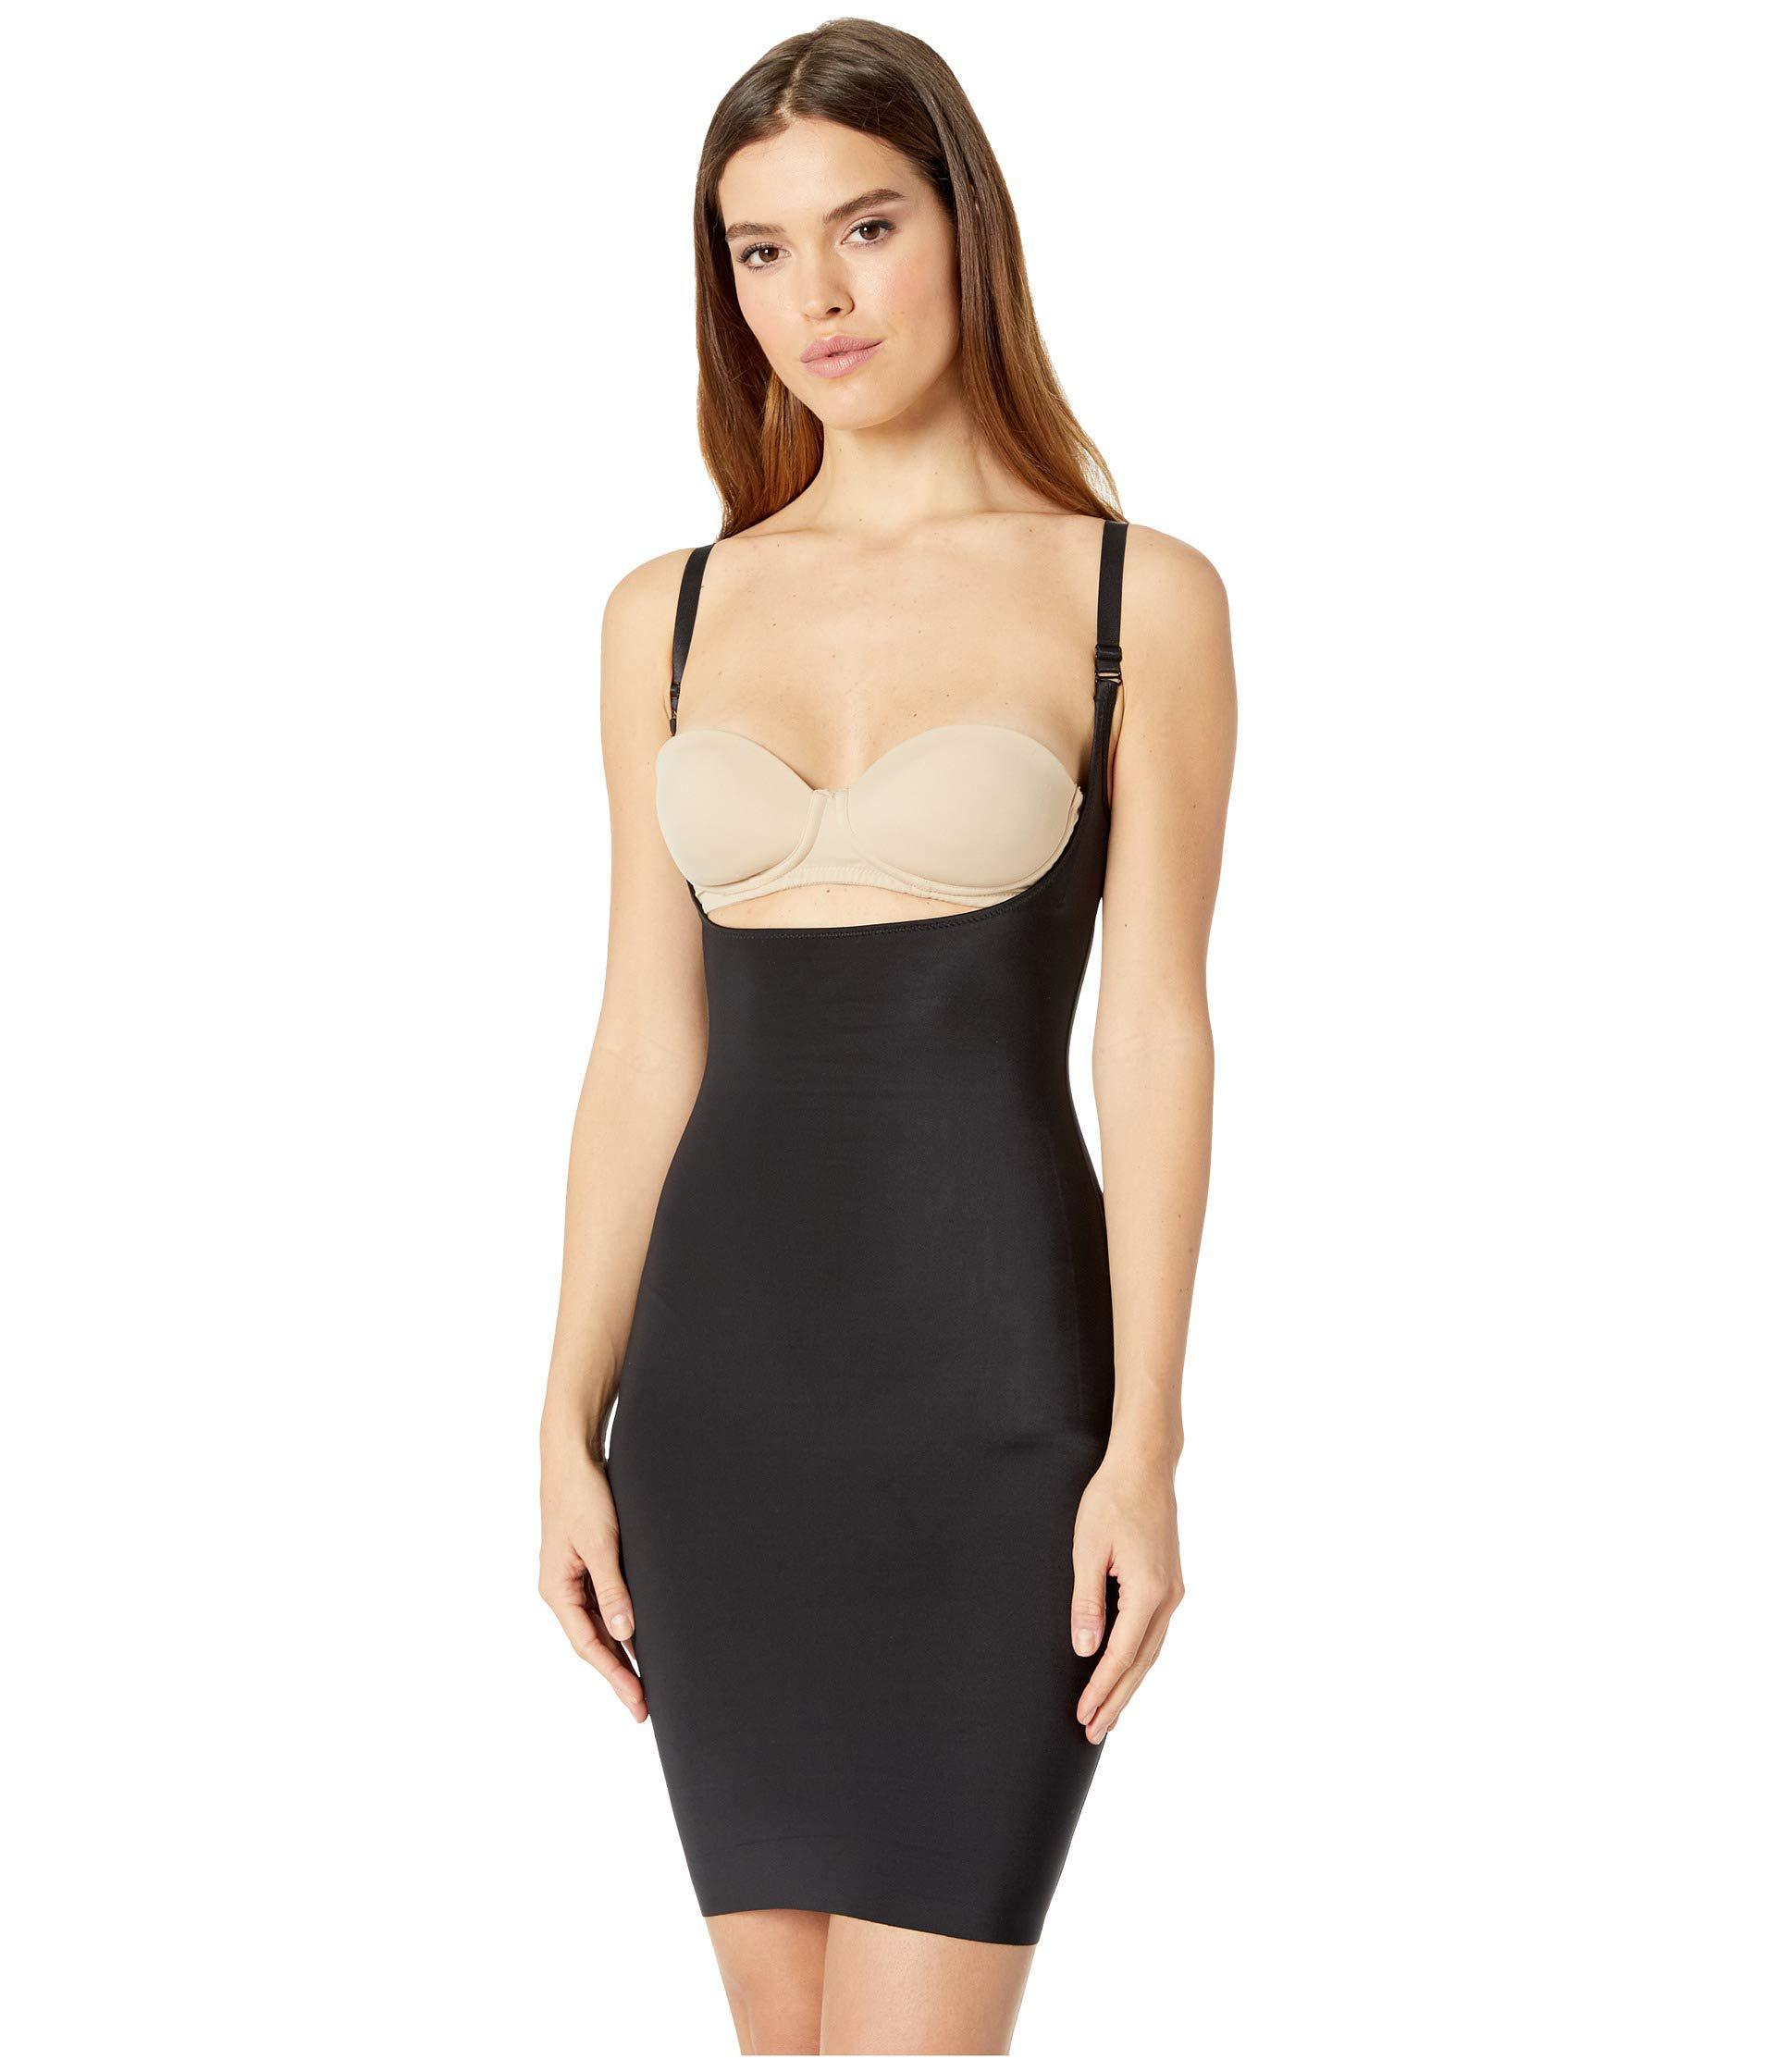 9785495dae Magic Bodyfashion. Black Luxury Full Shapewear Slip Dress (latte) Women s  Underwear